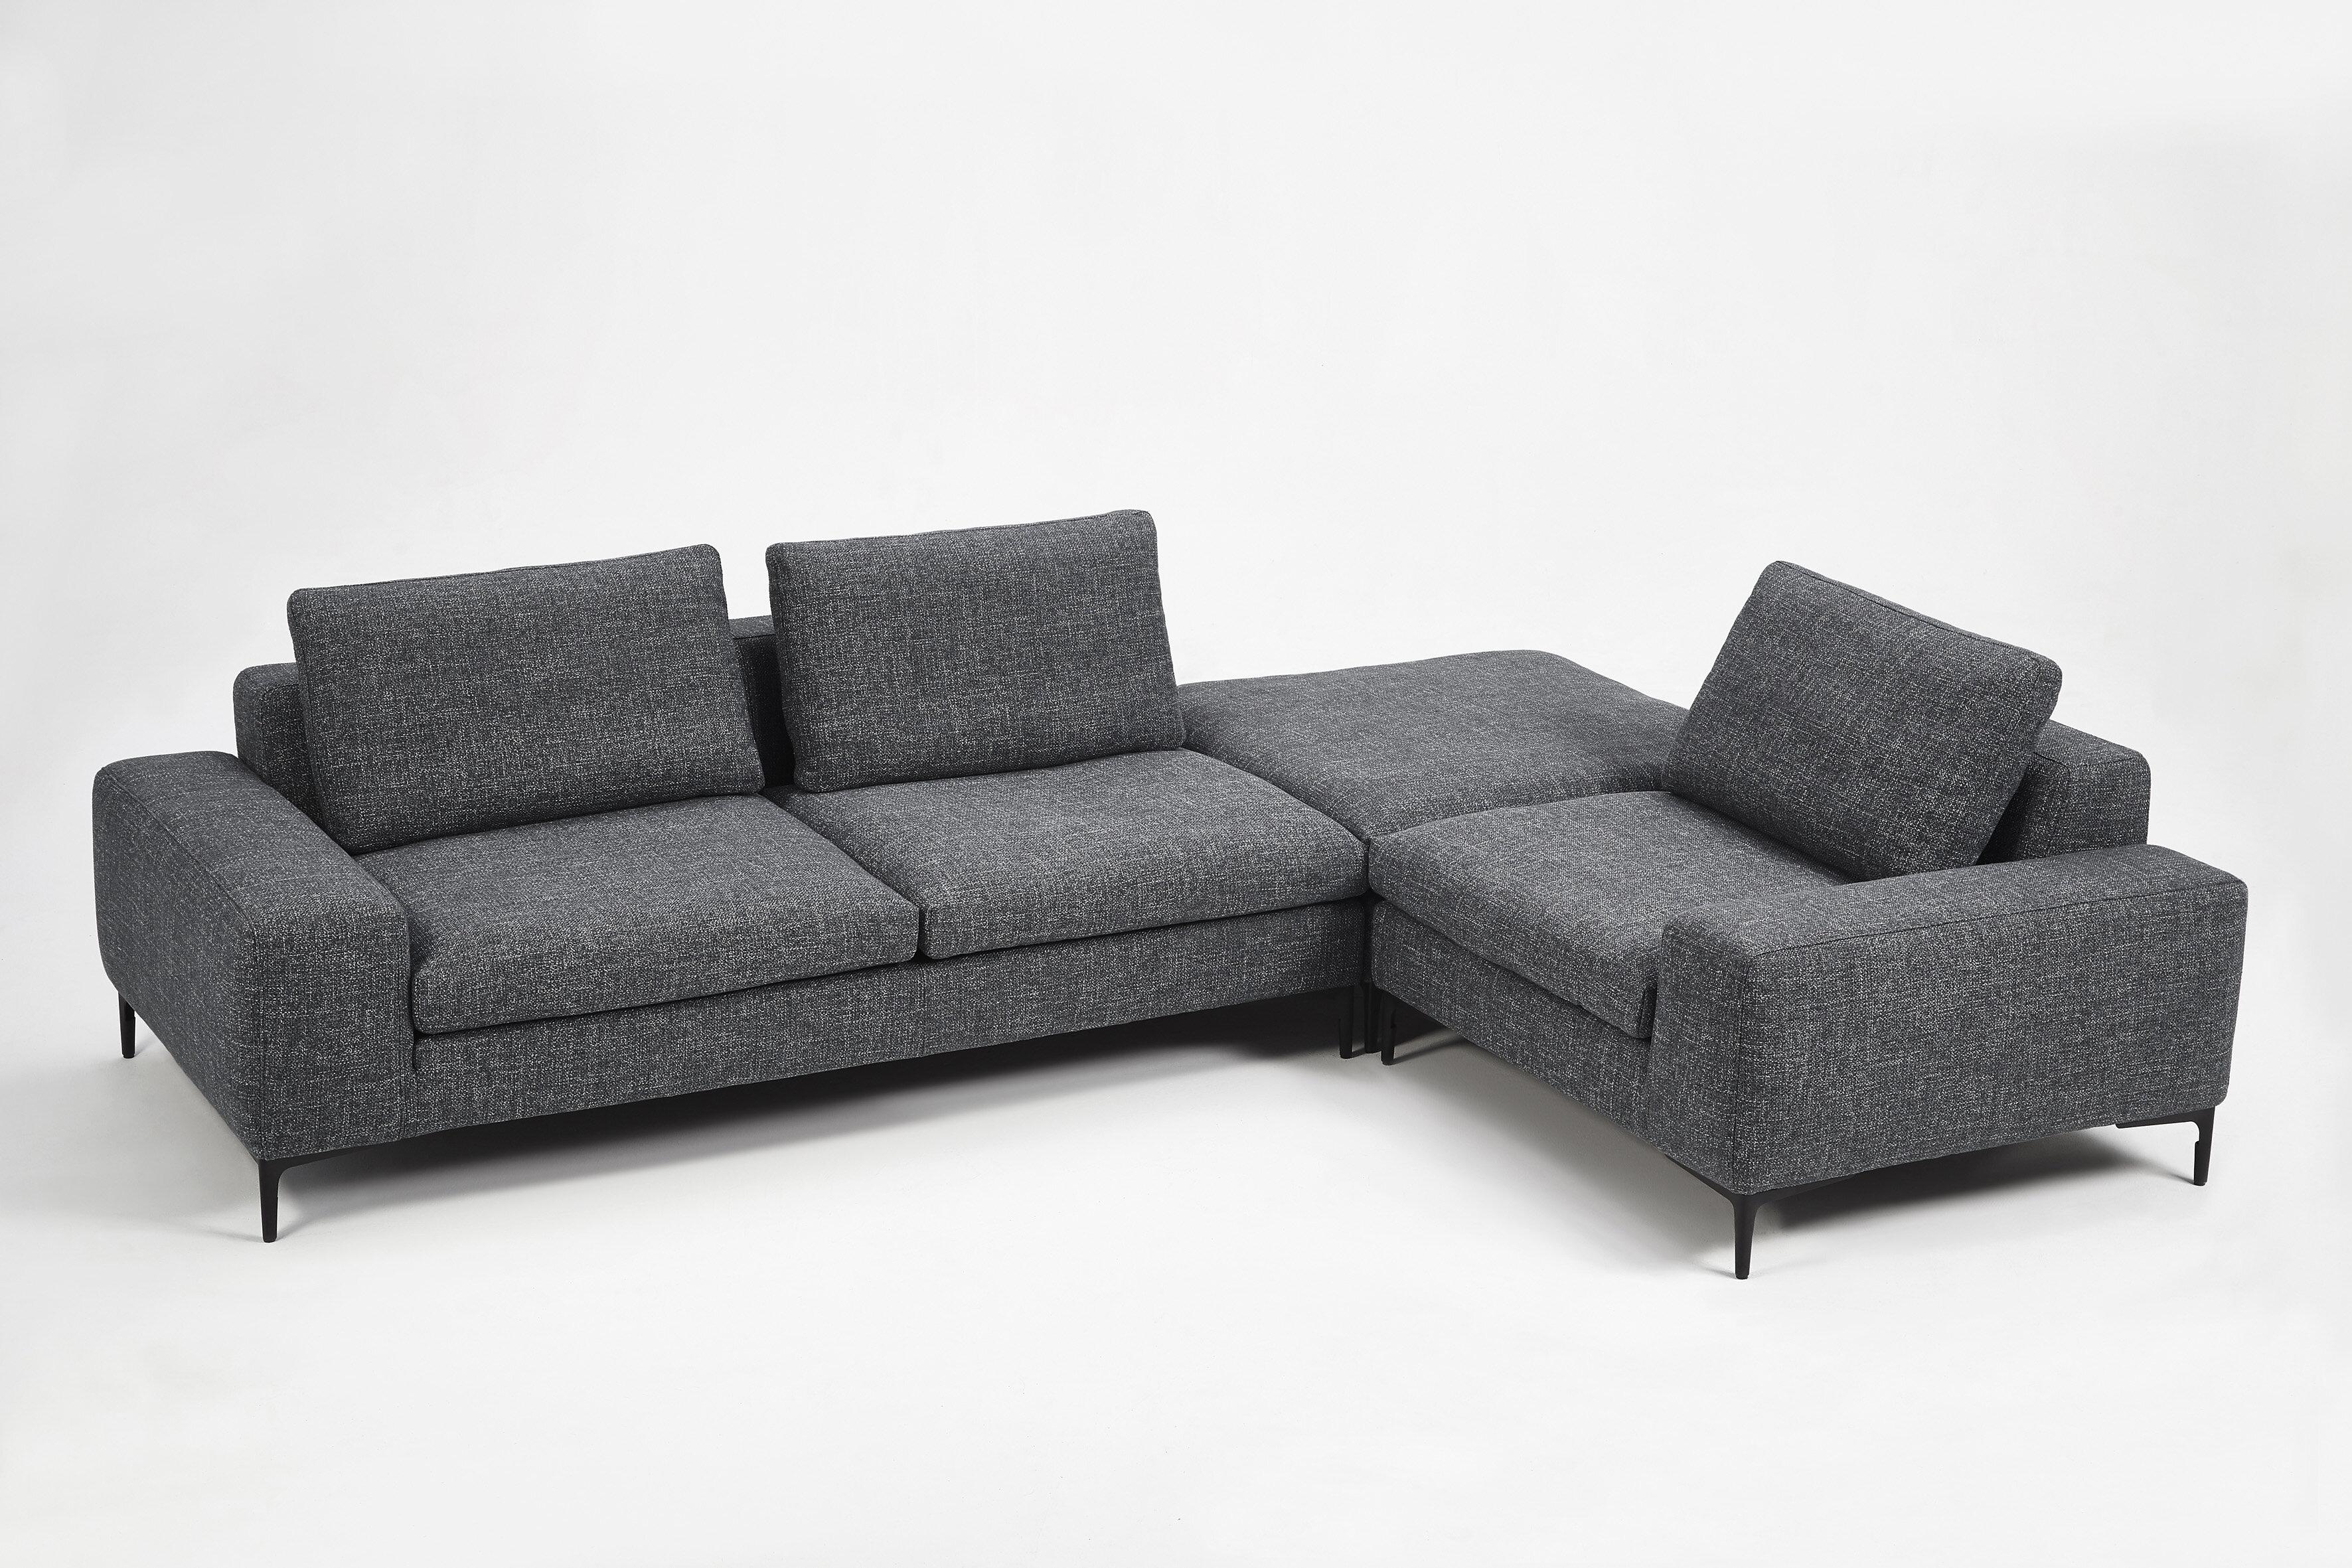 Miraculous Whitney Right Hand Facing Modern Modular Sectional With Ottoman Uwap Interior Chair Design Uwaporg